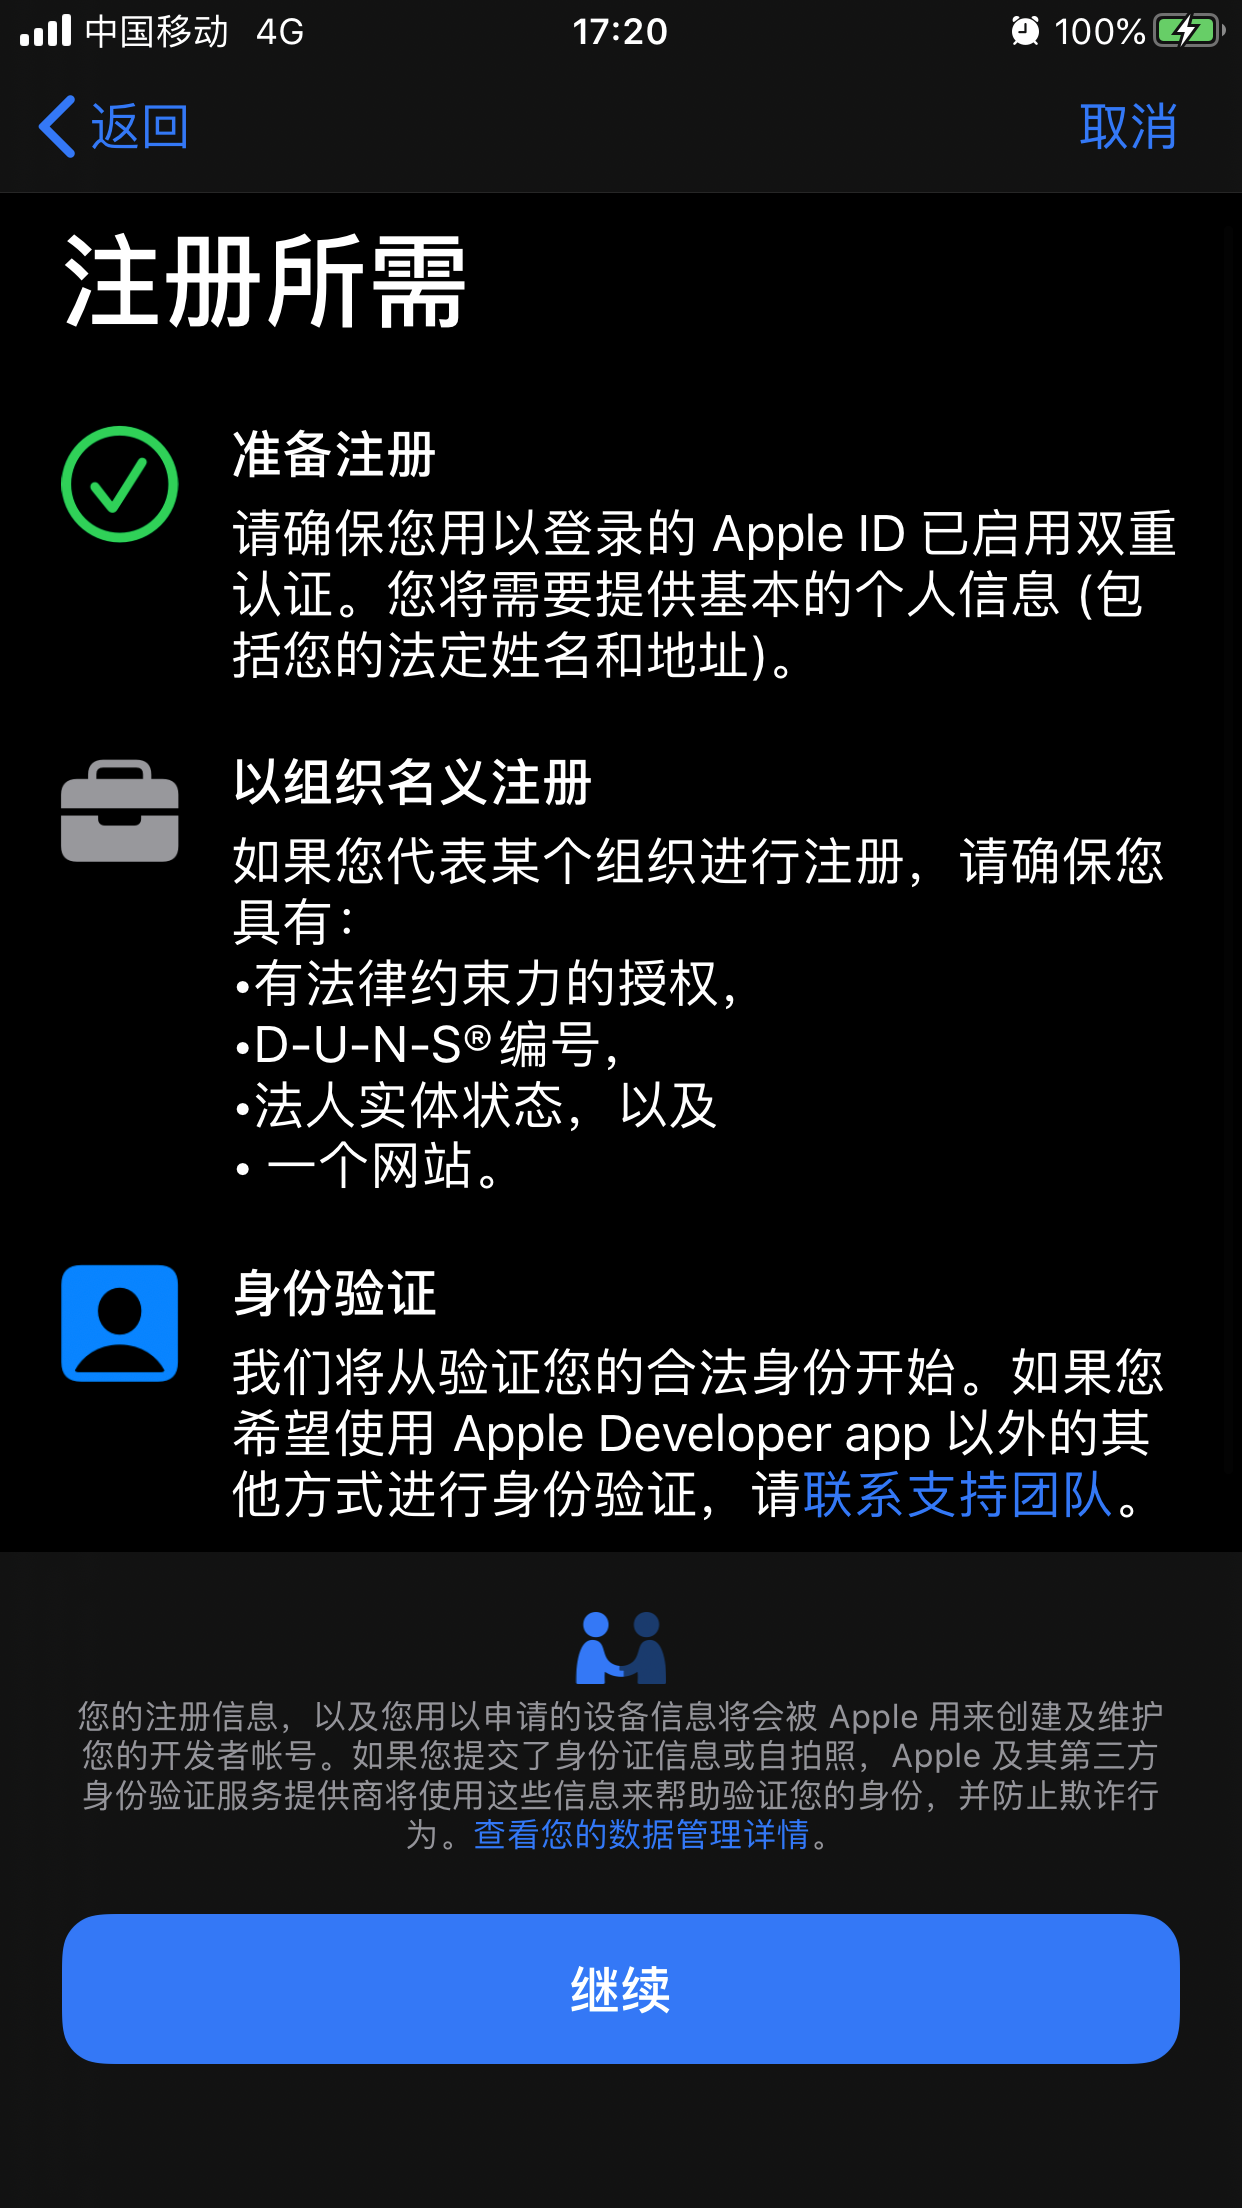 Apple Developer 开发者账号申请&实名认证【2020】